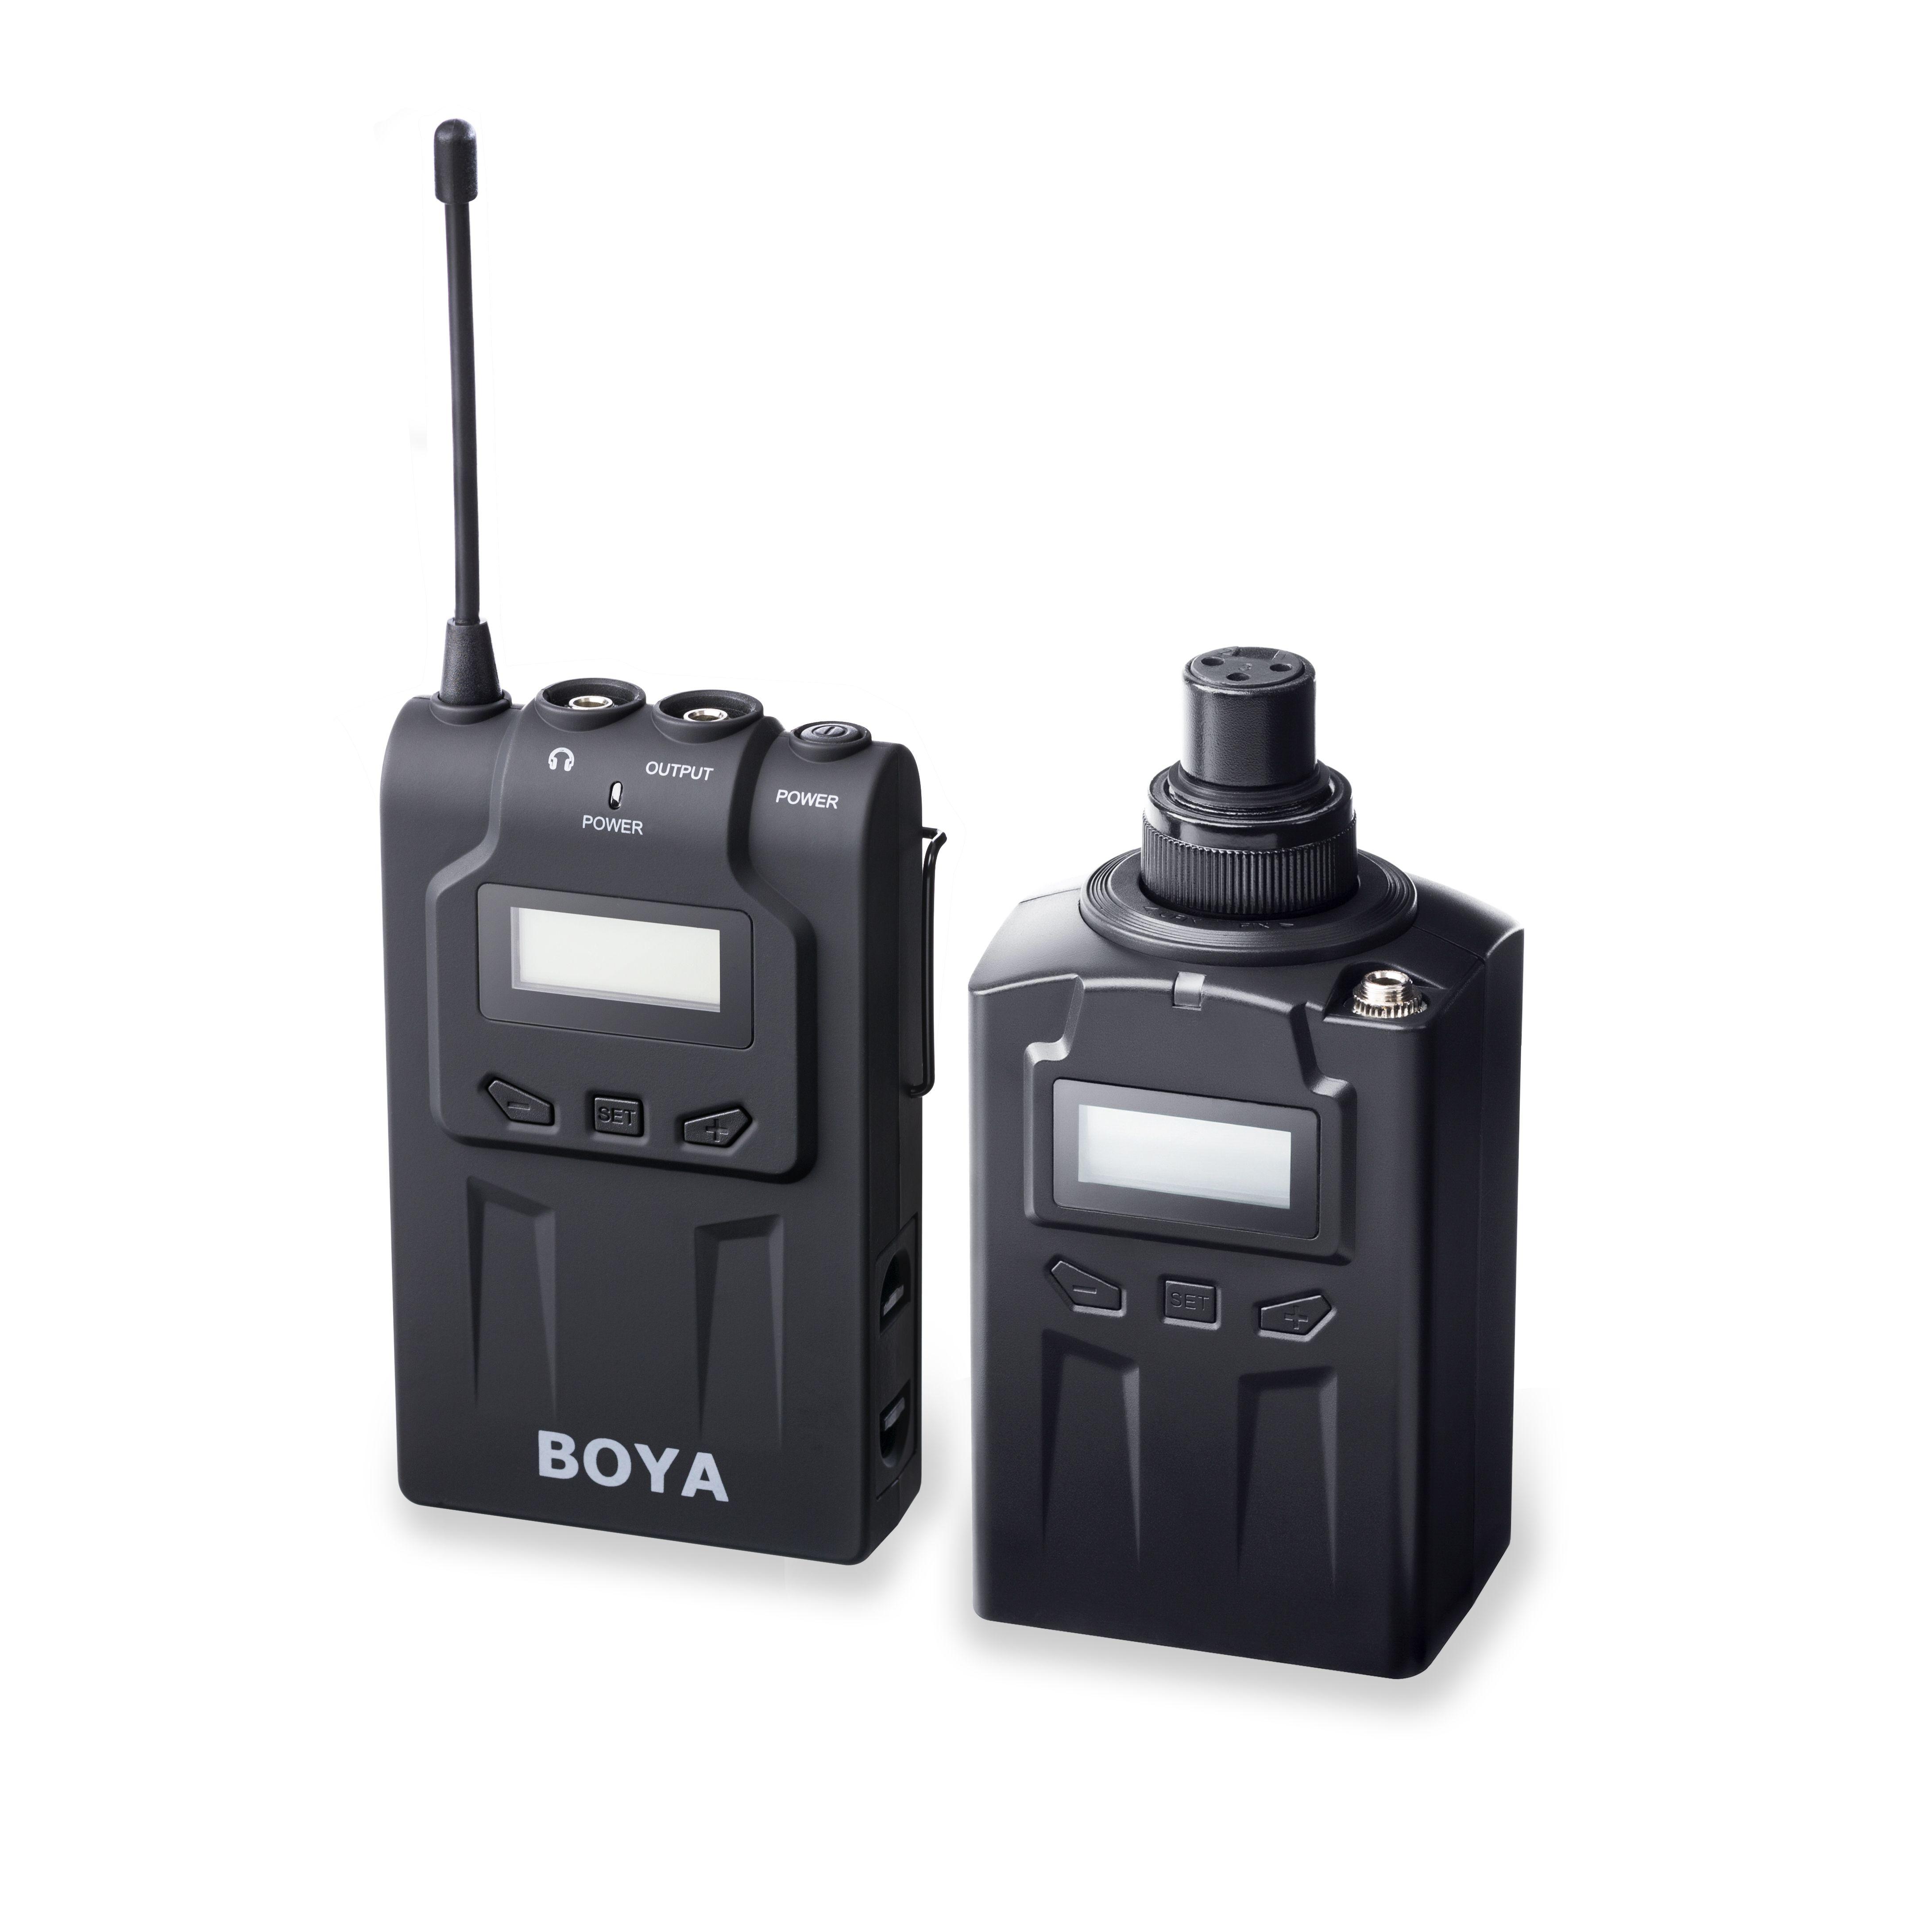 The By Wxlr8 Plug On Xlr Transmitter For Boya Wm6 And Wm8 Uhf Wiring Audio Musical Theatre